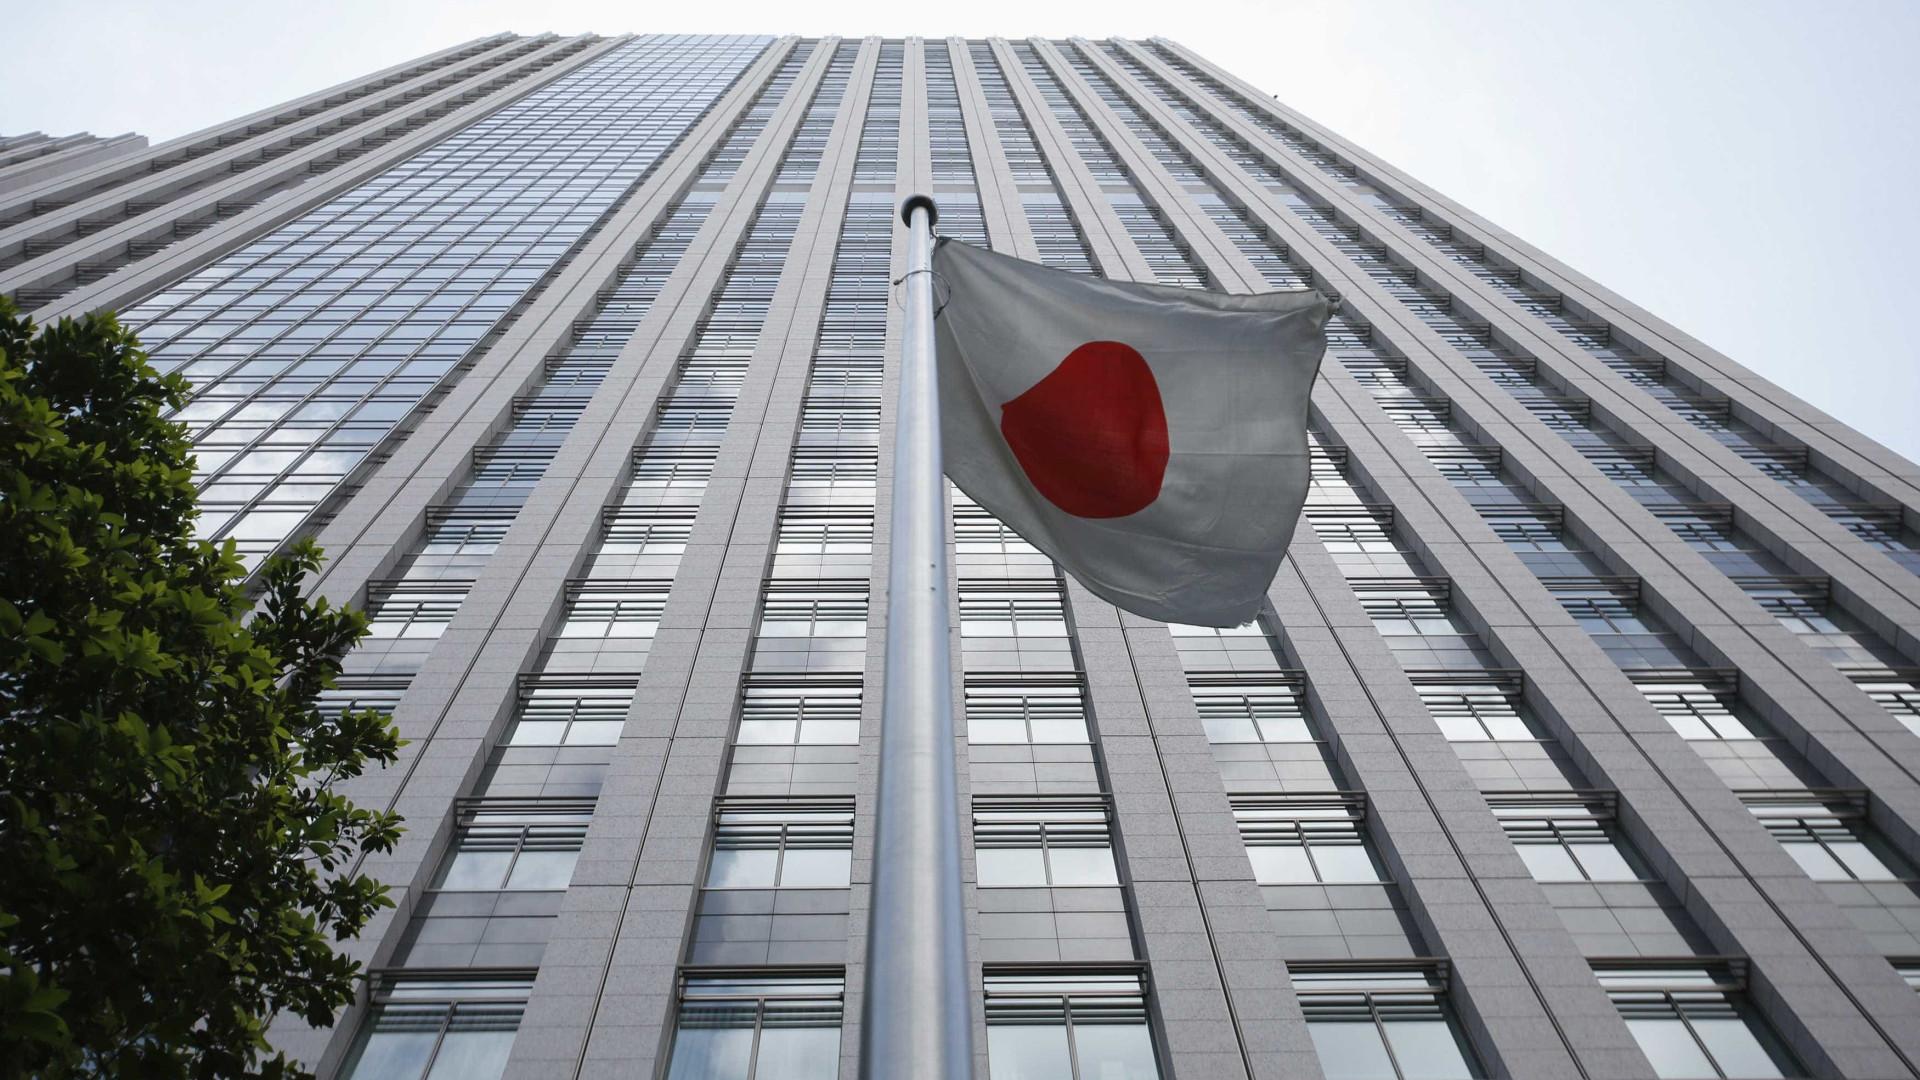 Economia japonesa cresce 0,5% no último trimestre de 2017